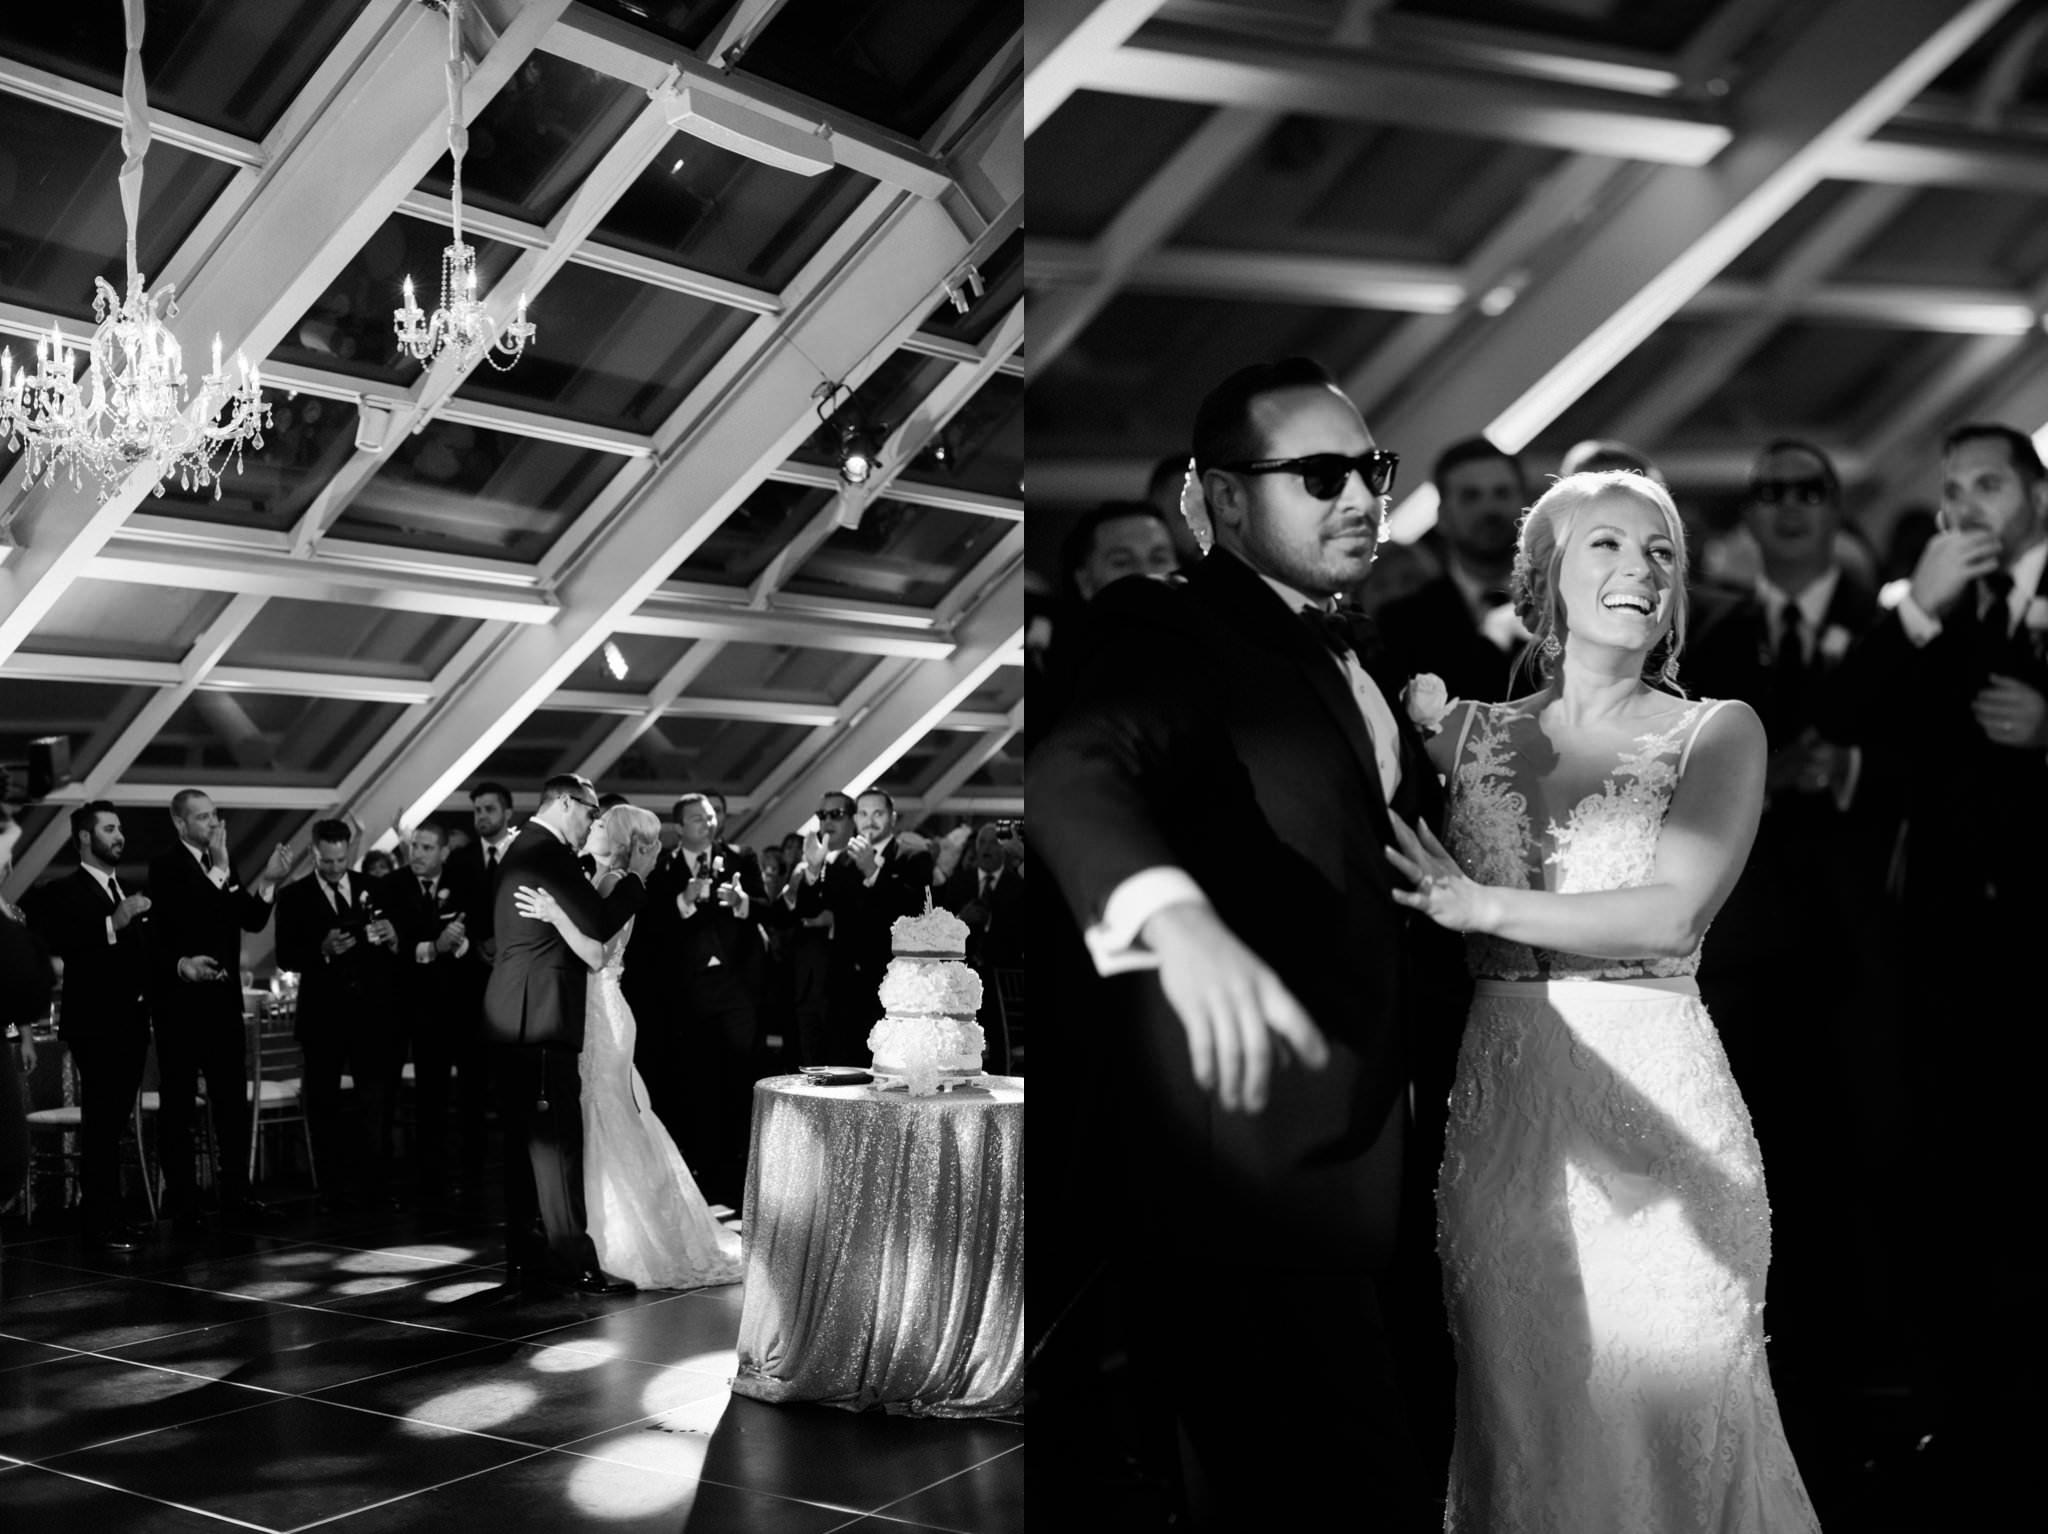 Adler-Planetarium-Chicago-Wedding-Photography-0091.JPG